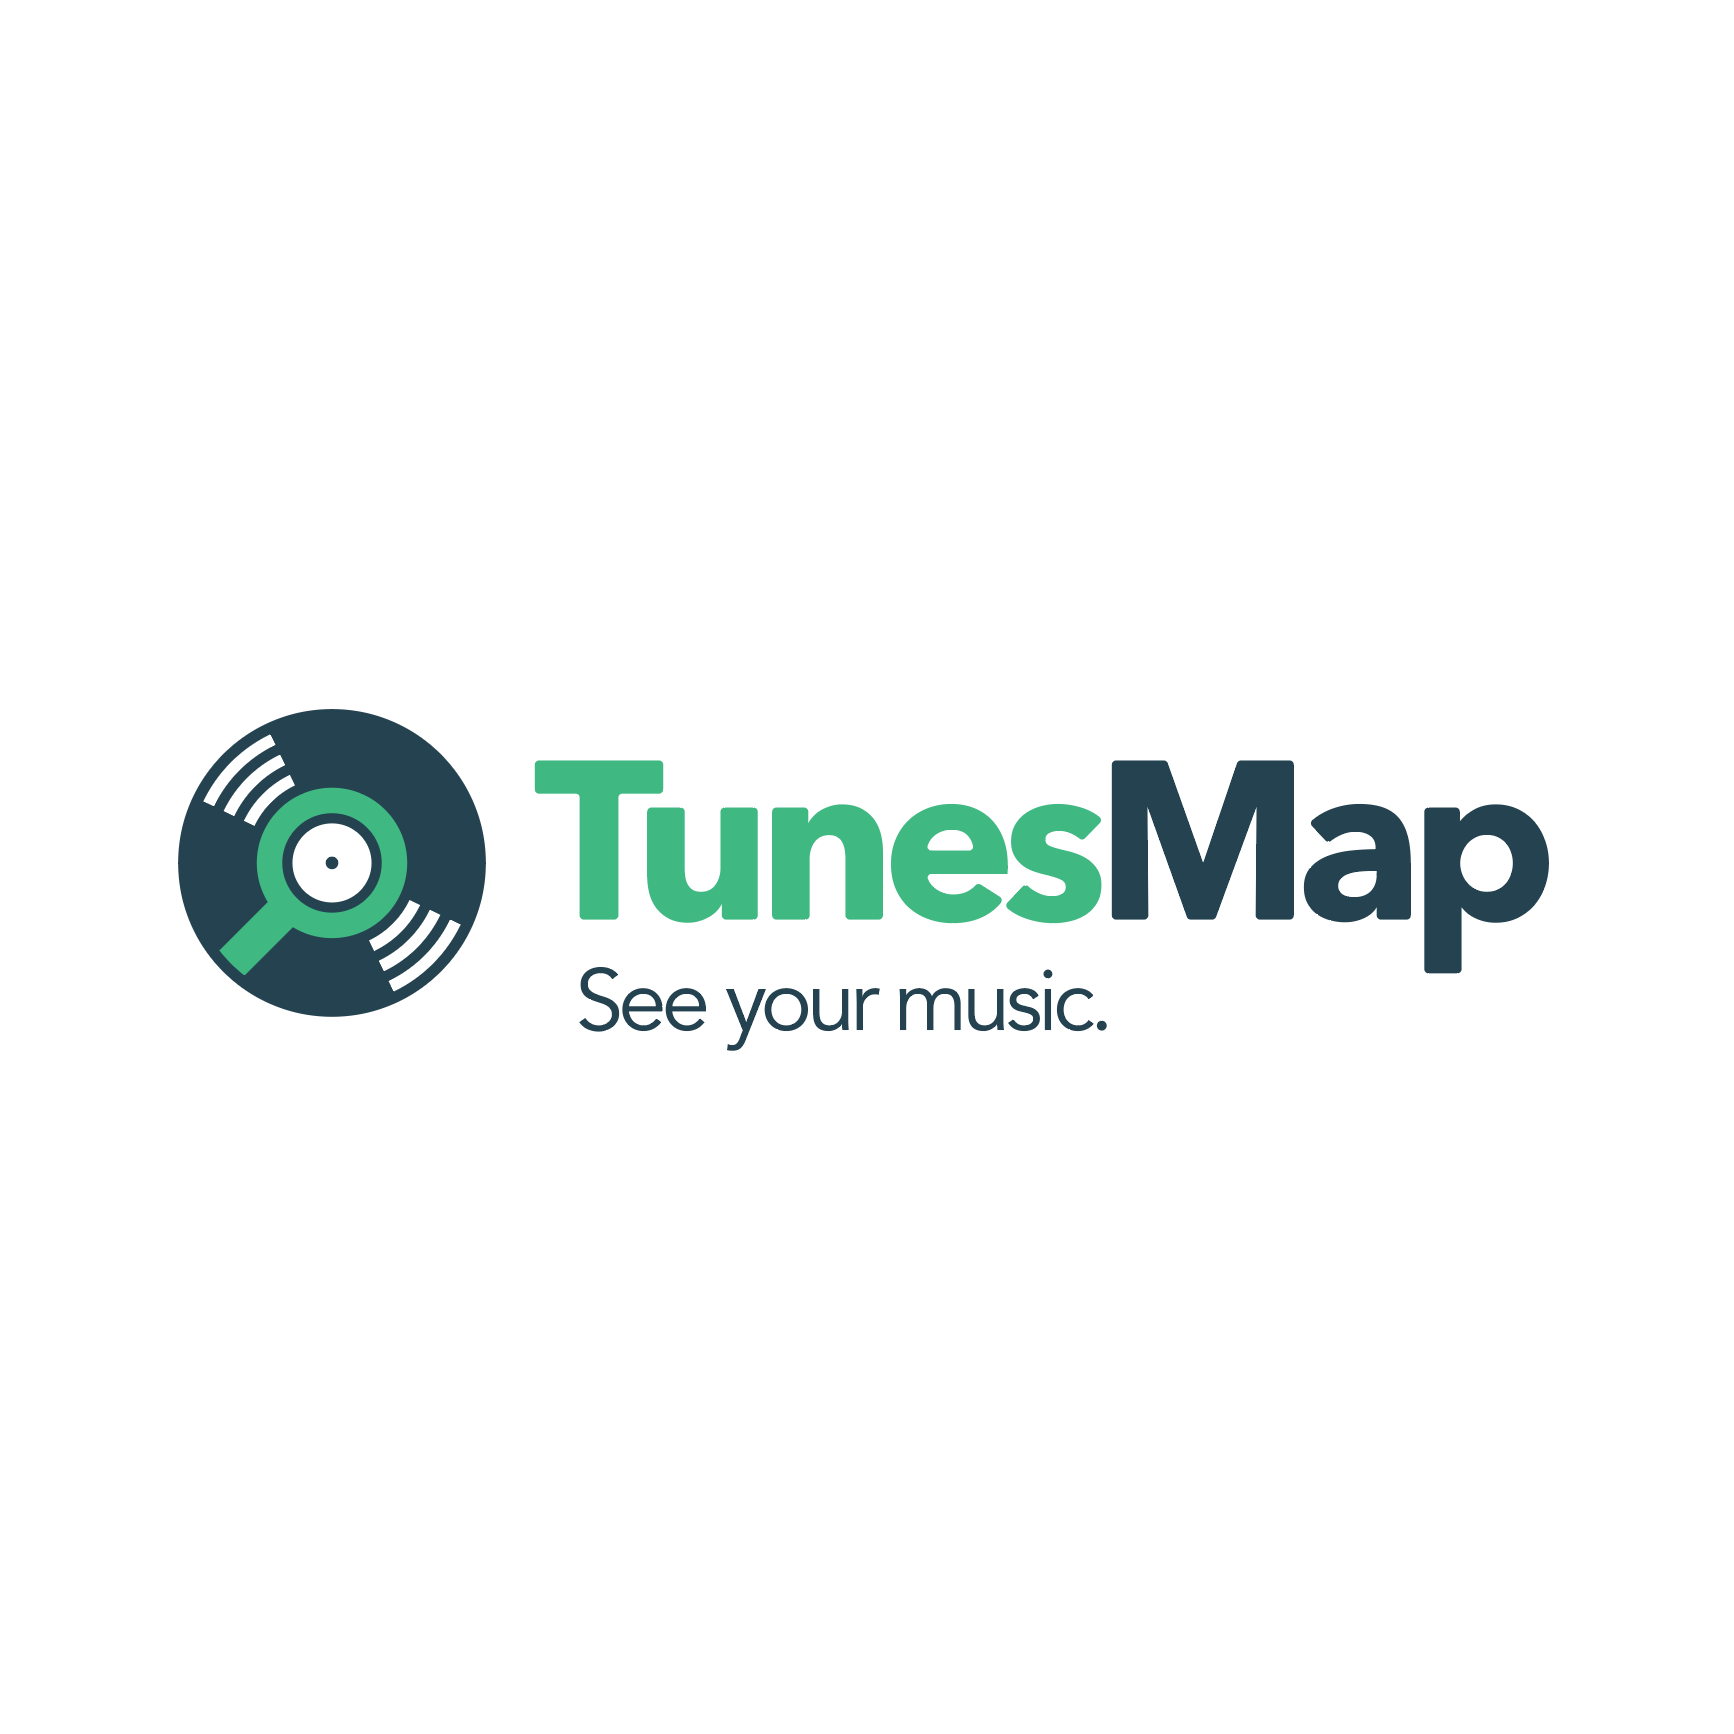 TunesMap Logo